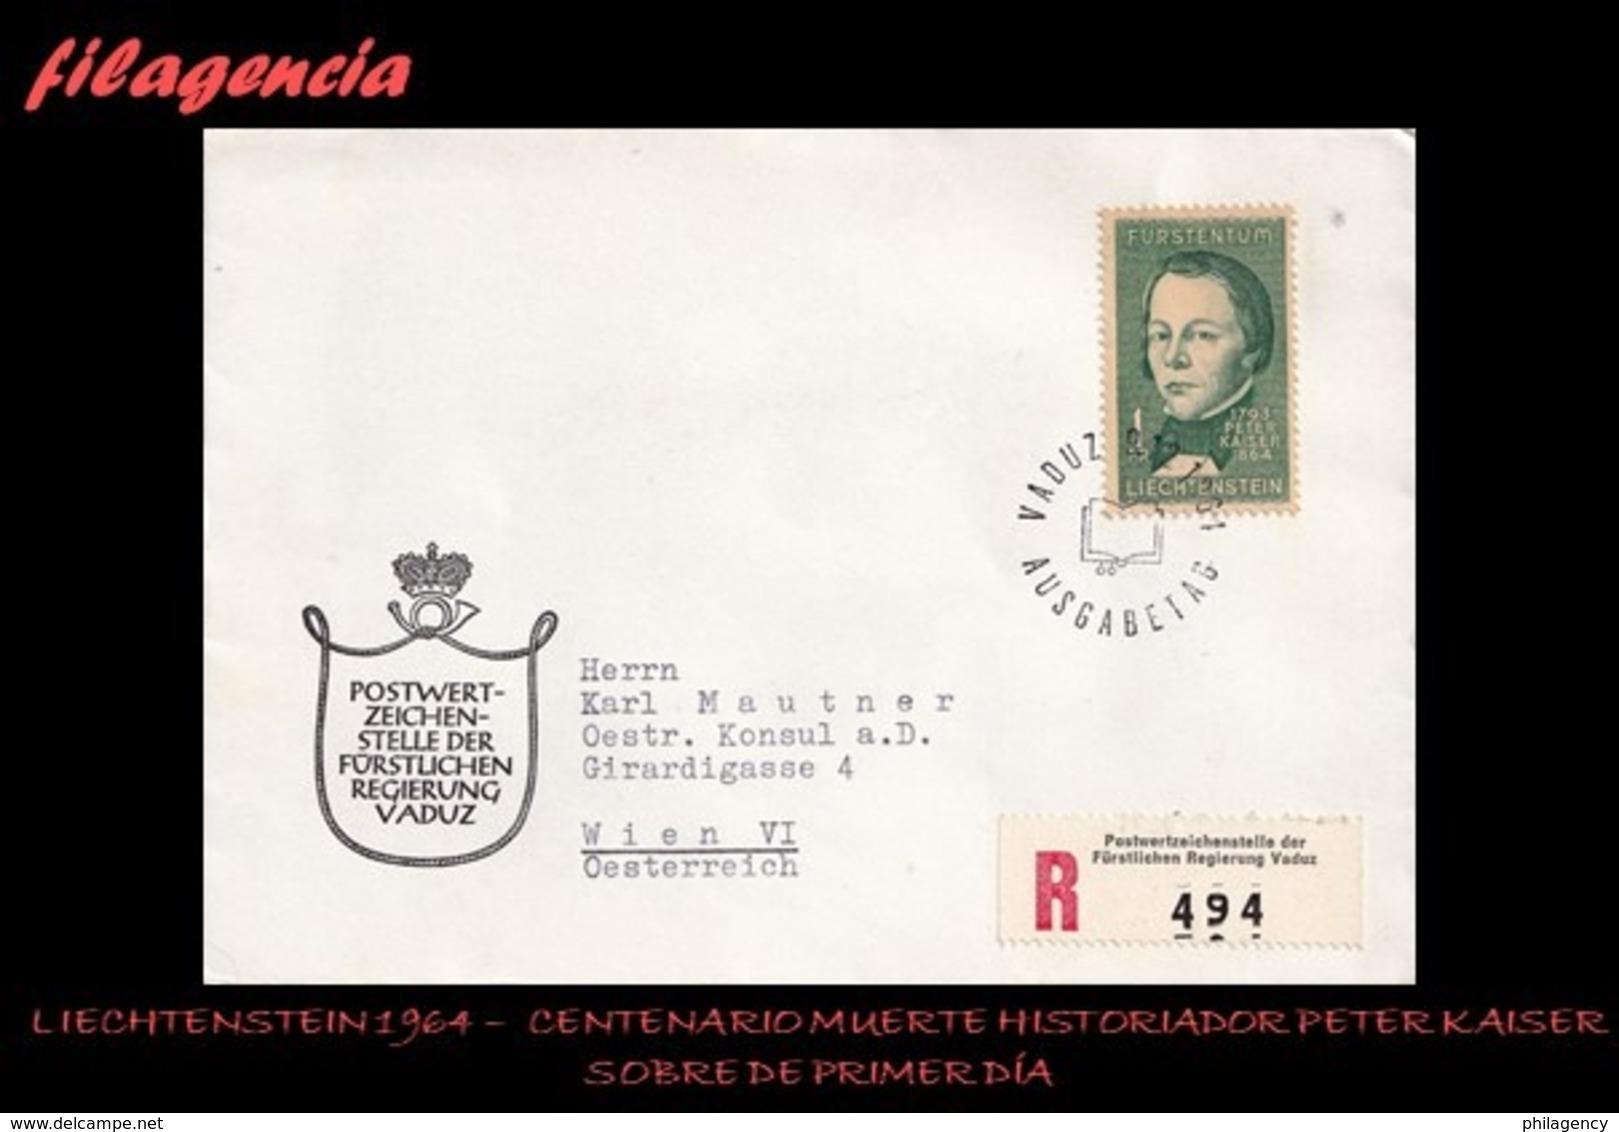 EUROPA. LIECHTENSTEIN SPD-FDC. 1964 CENTENARIO DE LA MUERTE DEL HISTORIADOR PETER KAISER - FDC